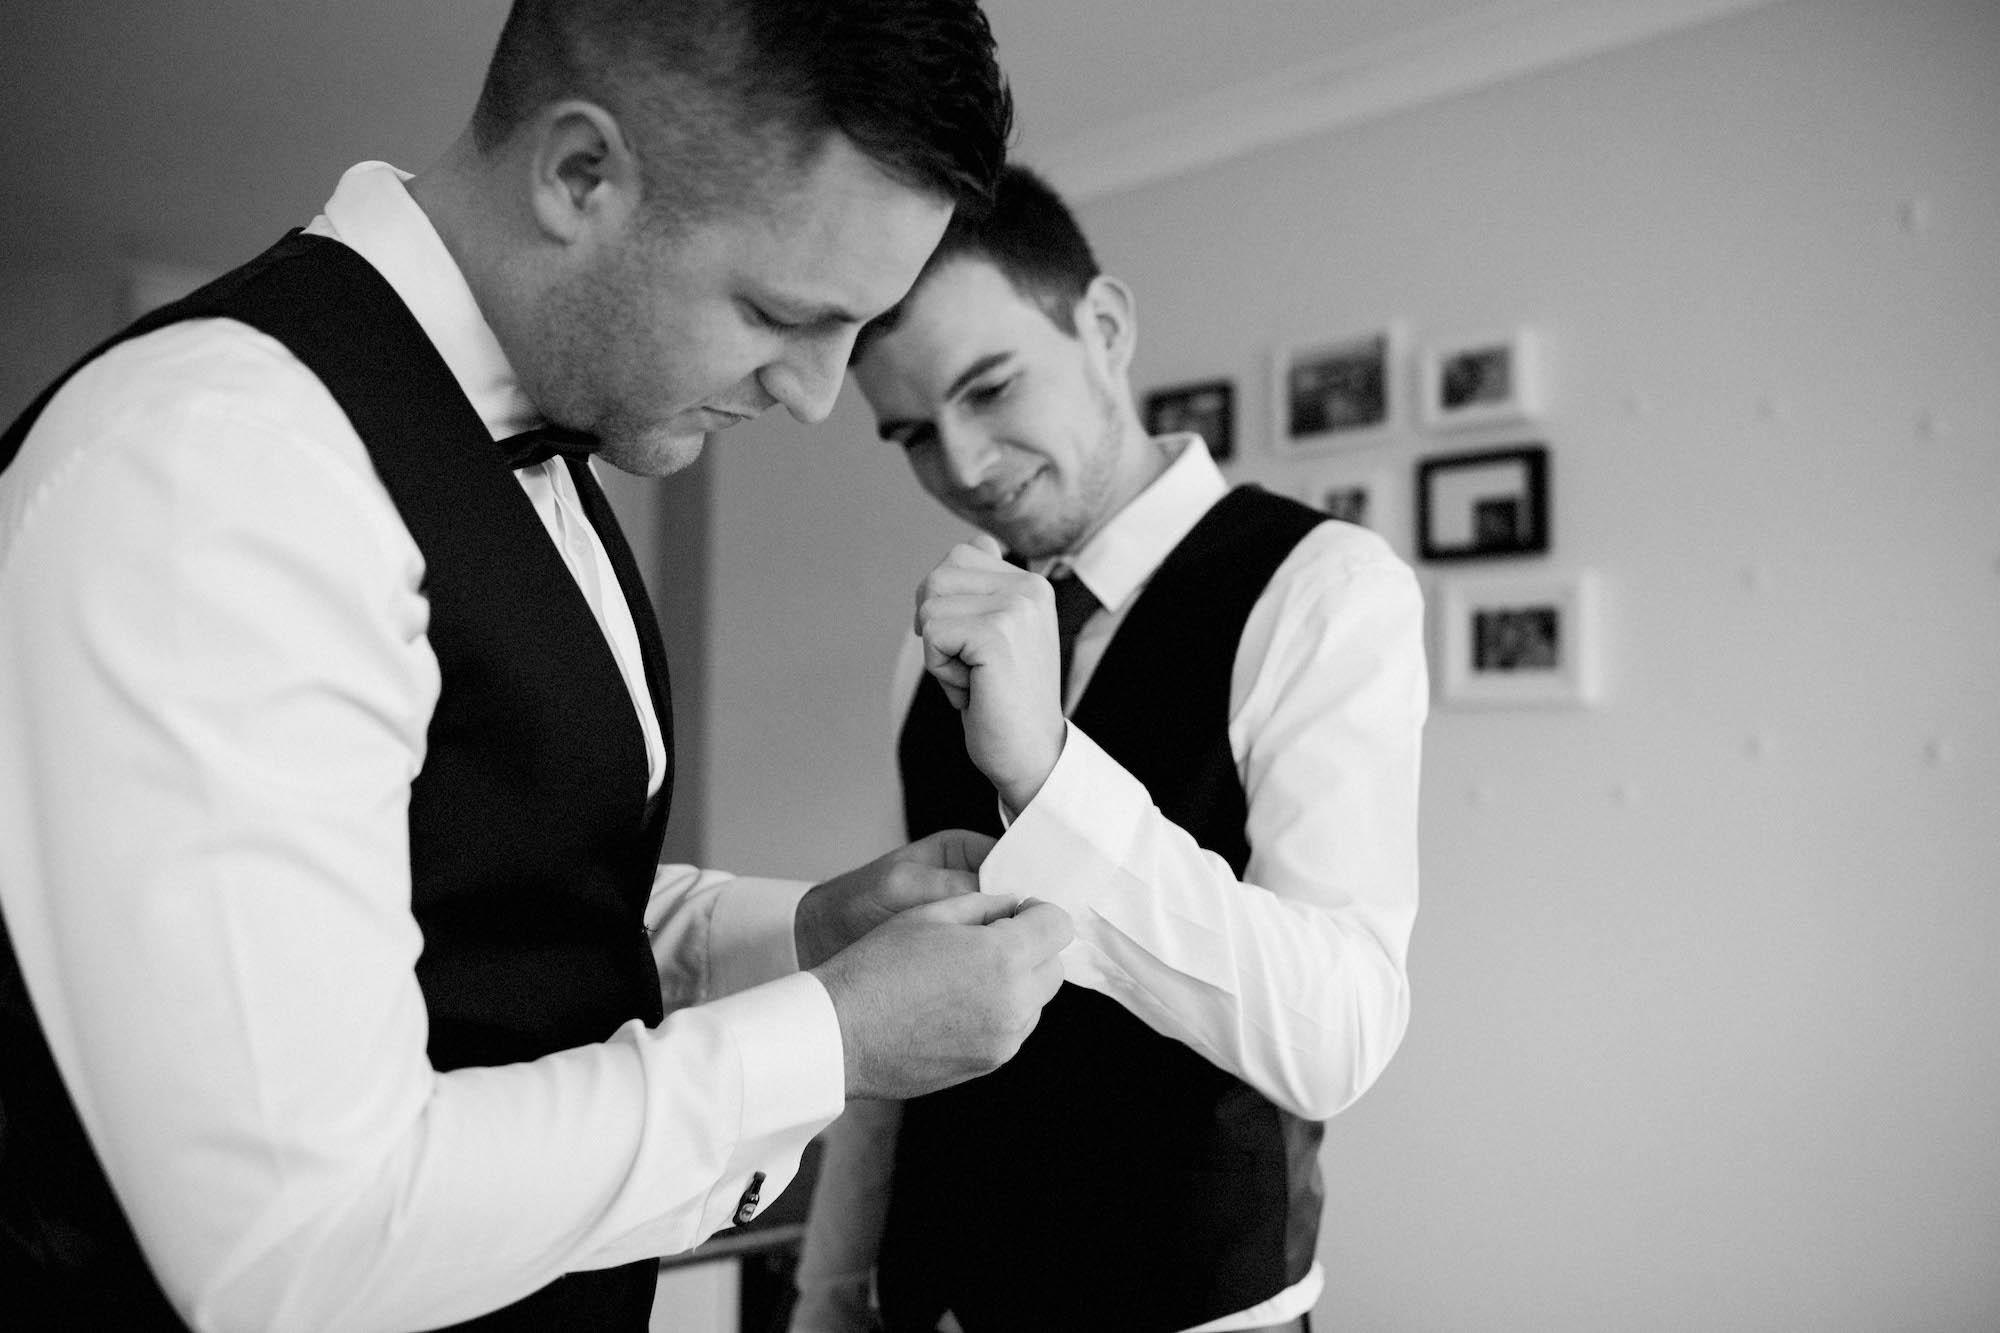 Groomsmen helping the groom put his cufflinks on before his Perth wedding.